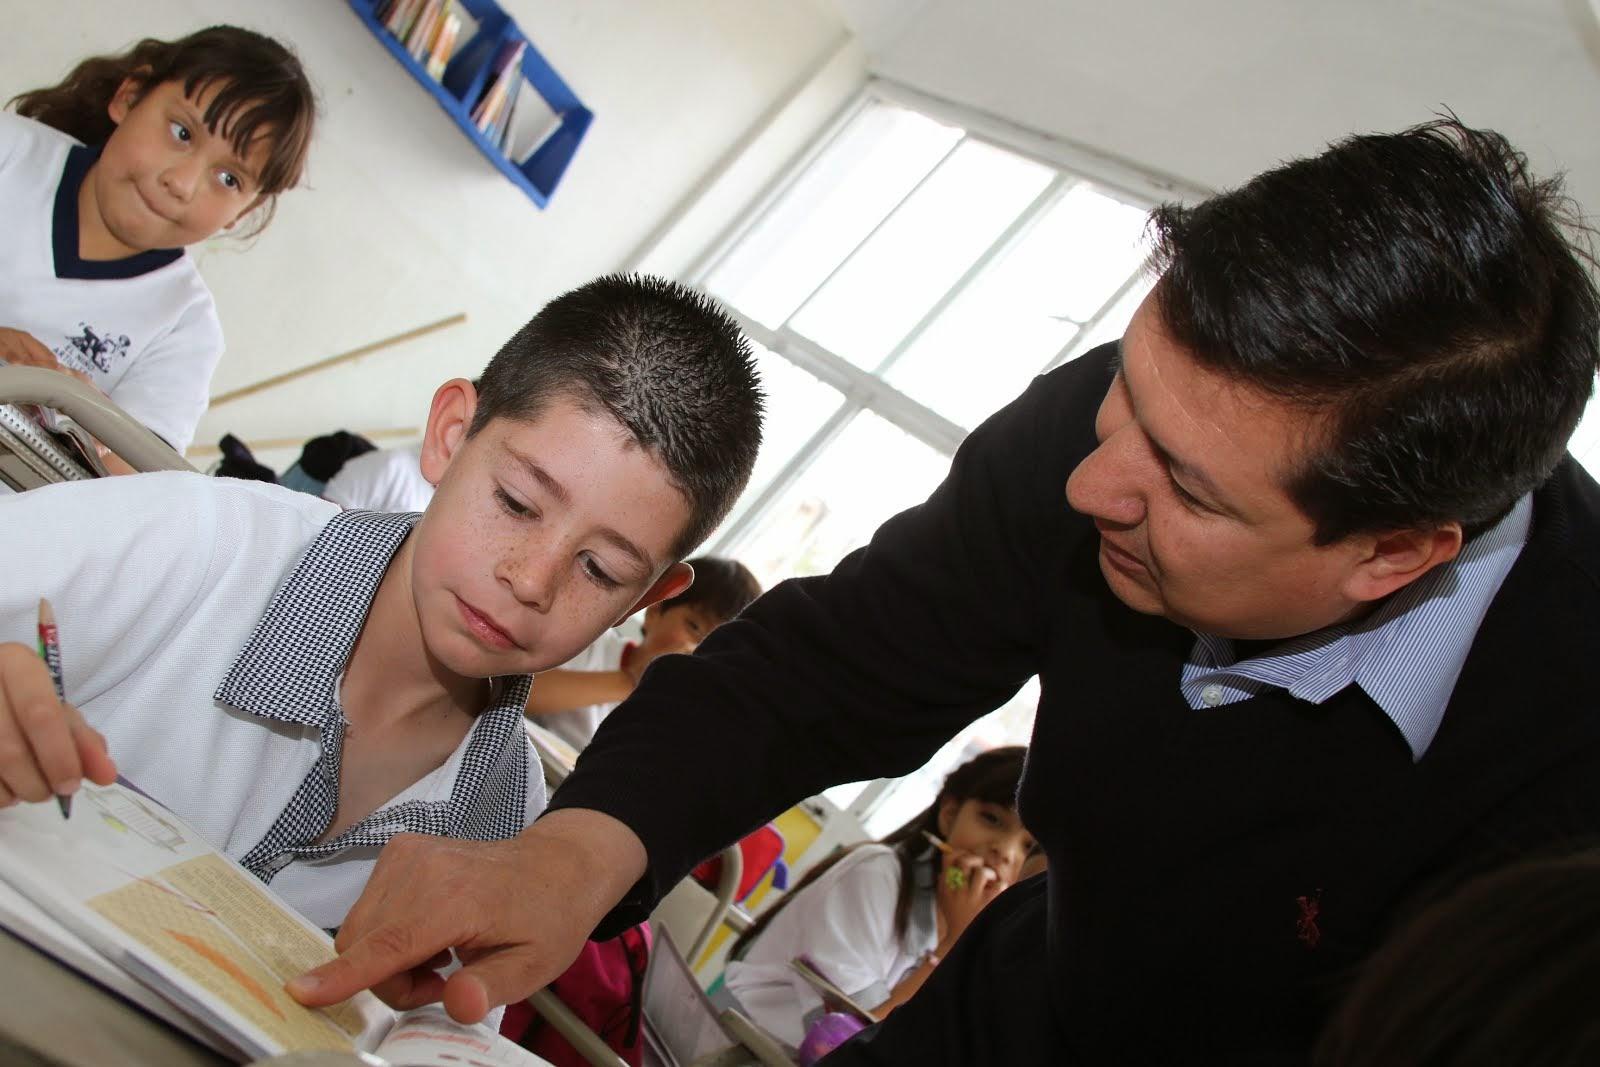 Iea lanza la convocatoria para obtener la medalla maestro for Convocatoria de maestros